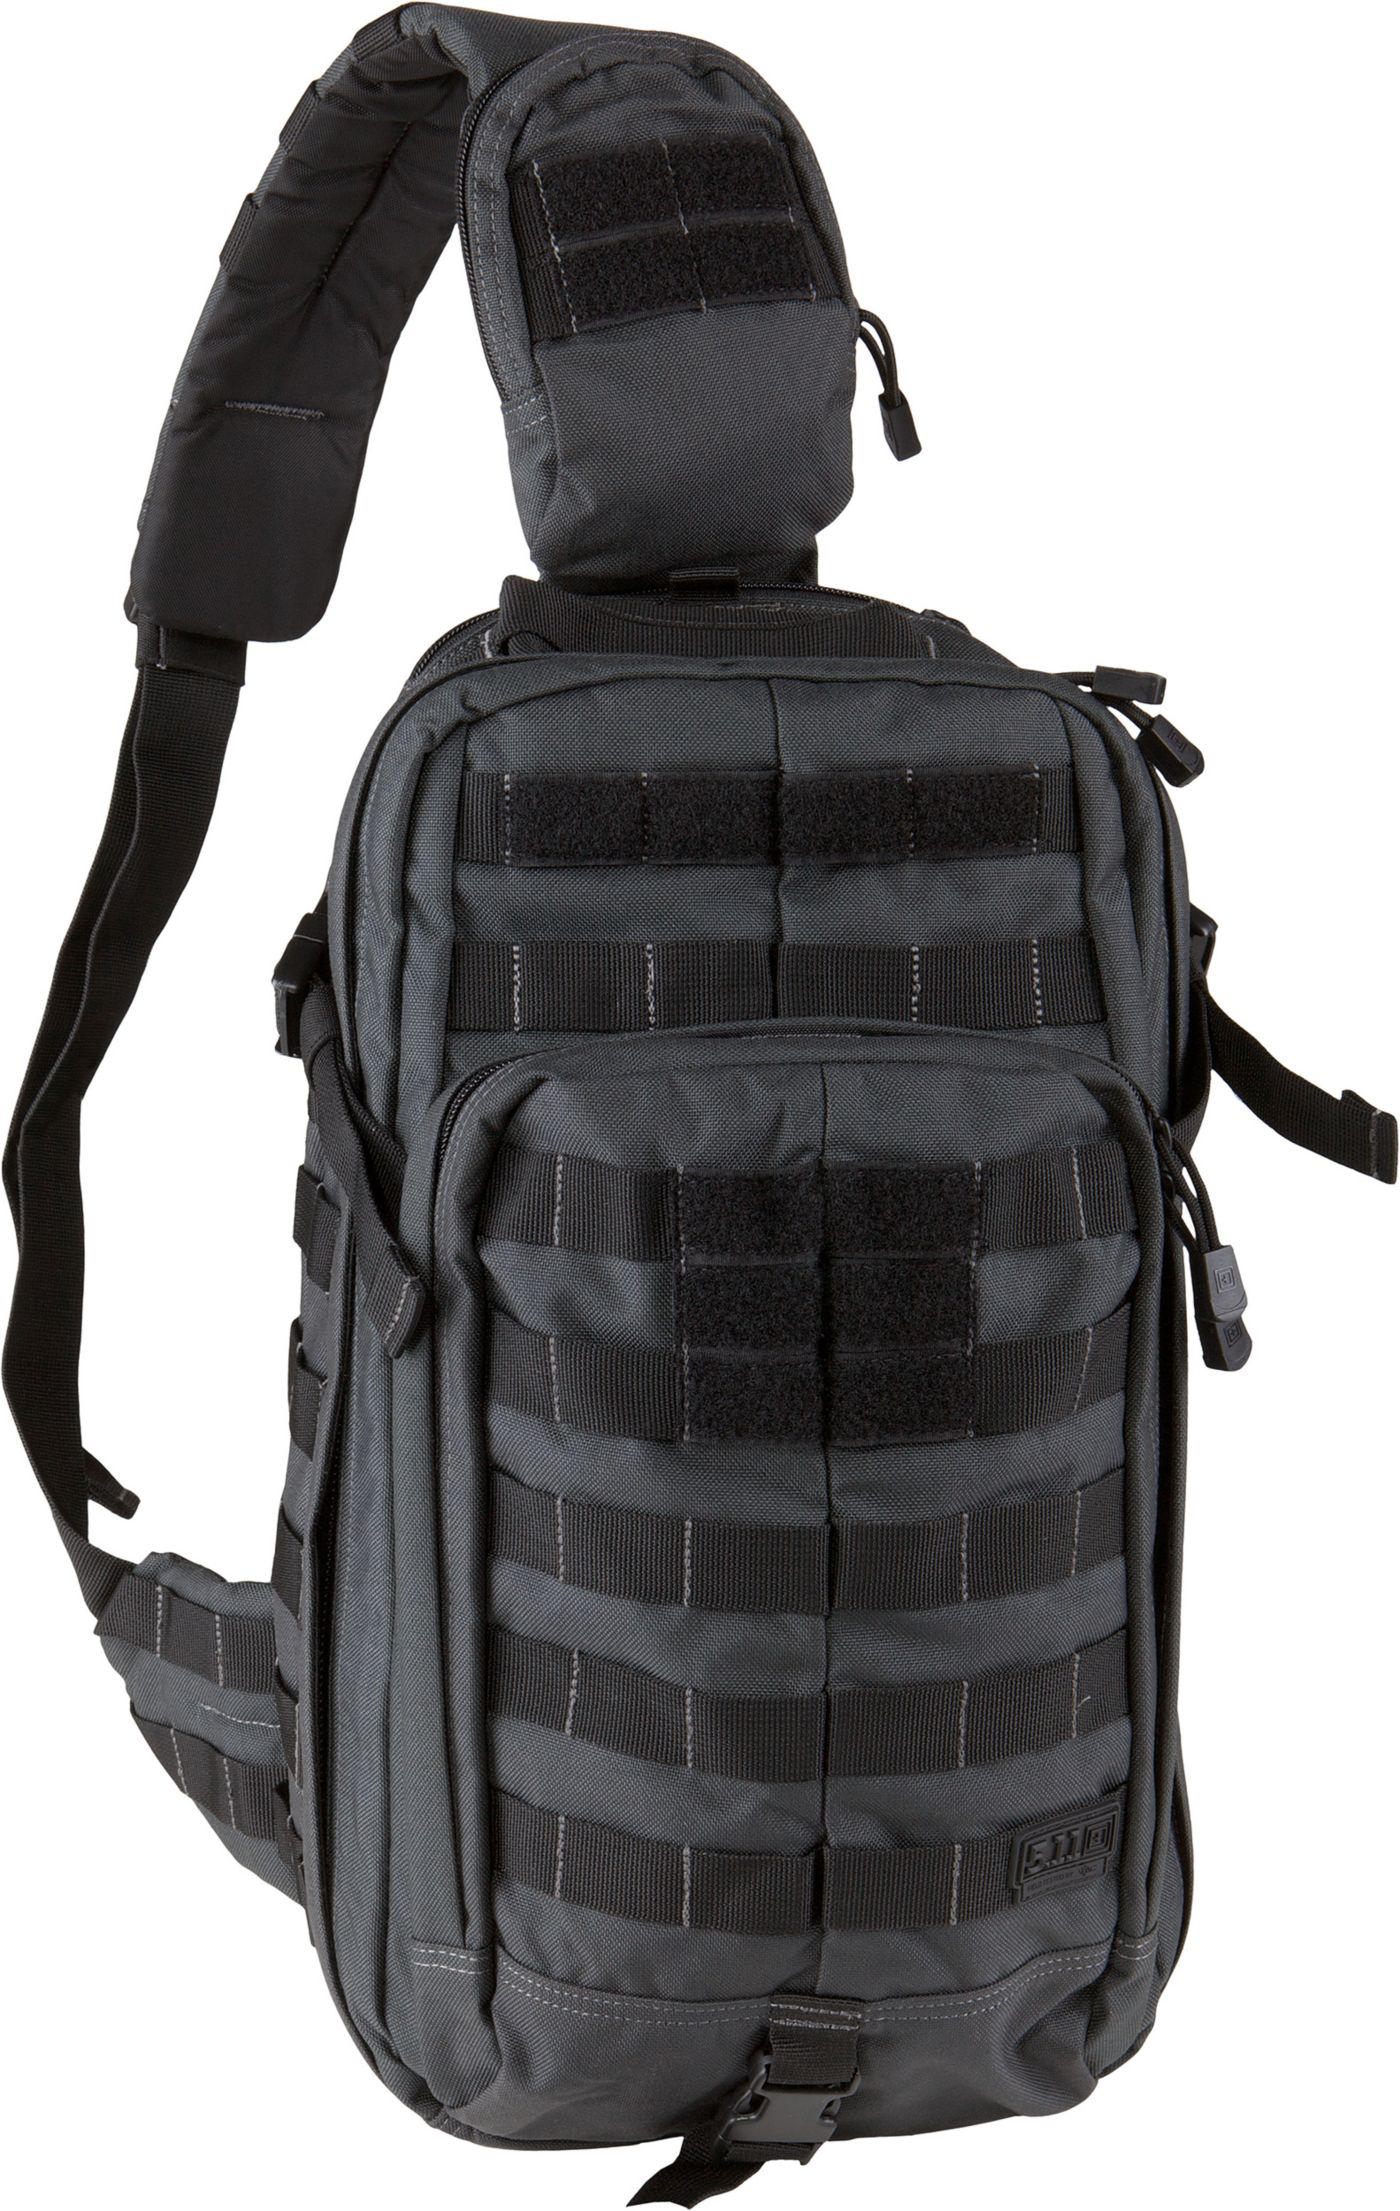 5.11 Tactical RUSH MOAB 10 Go Bag